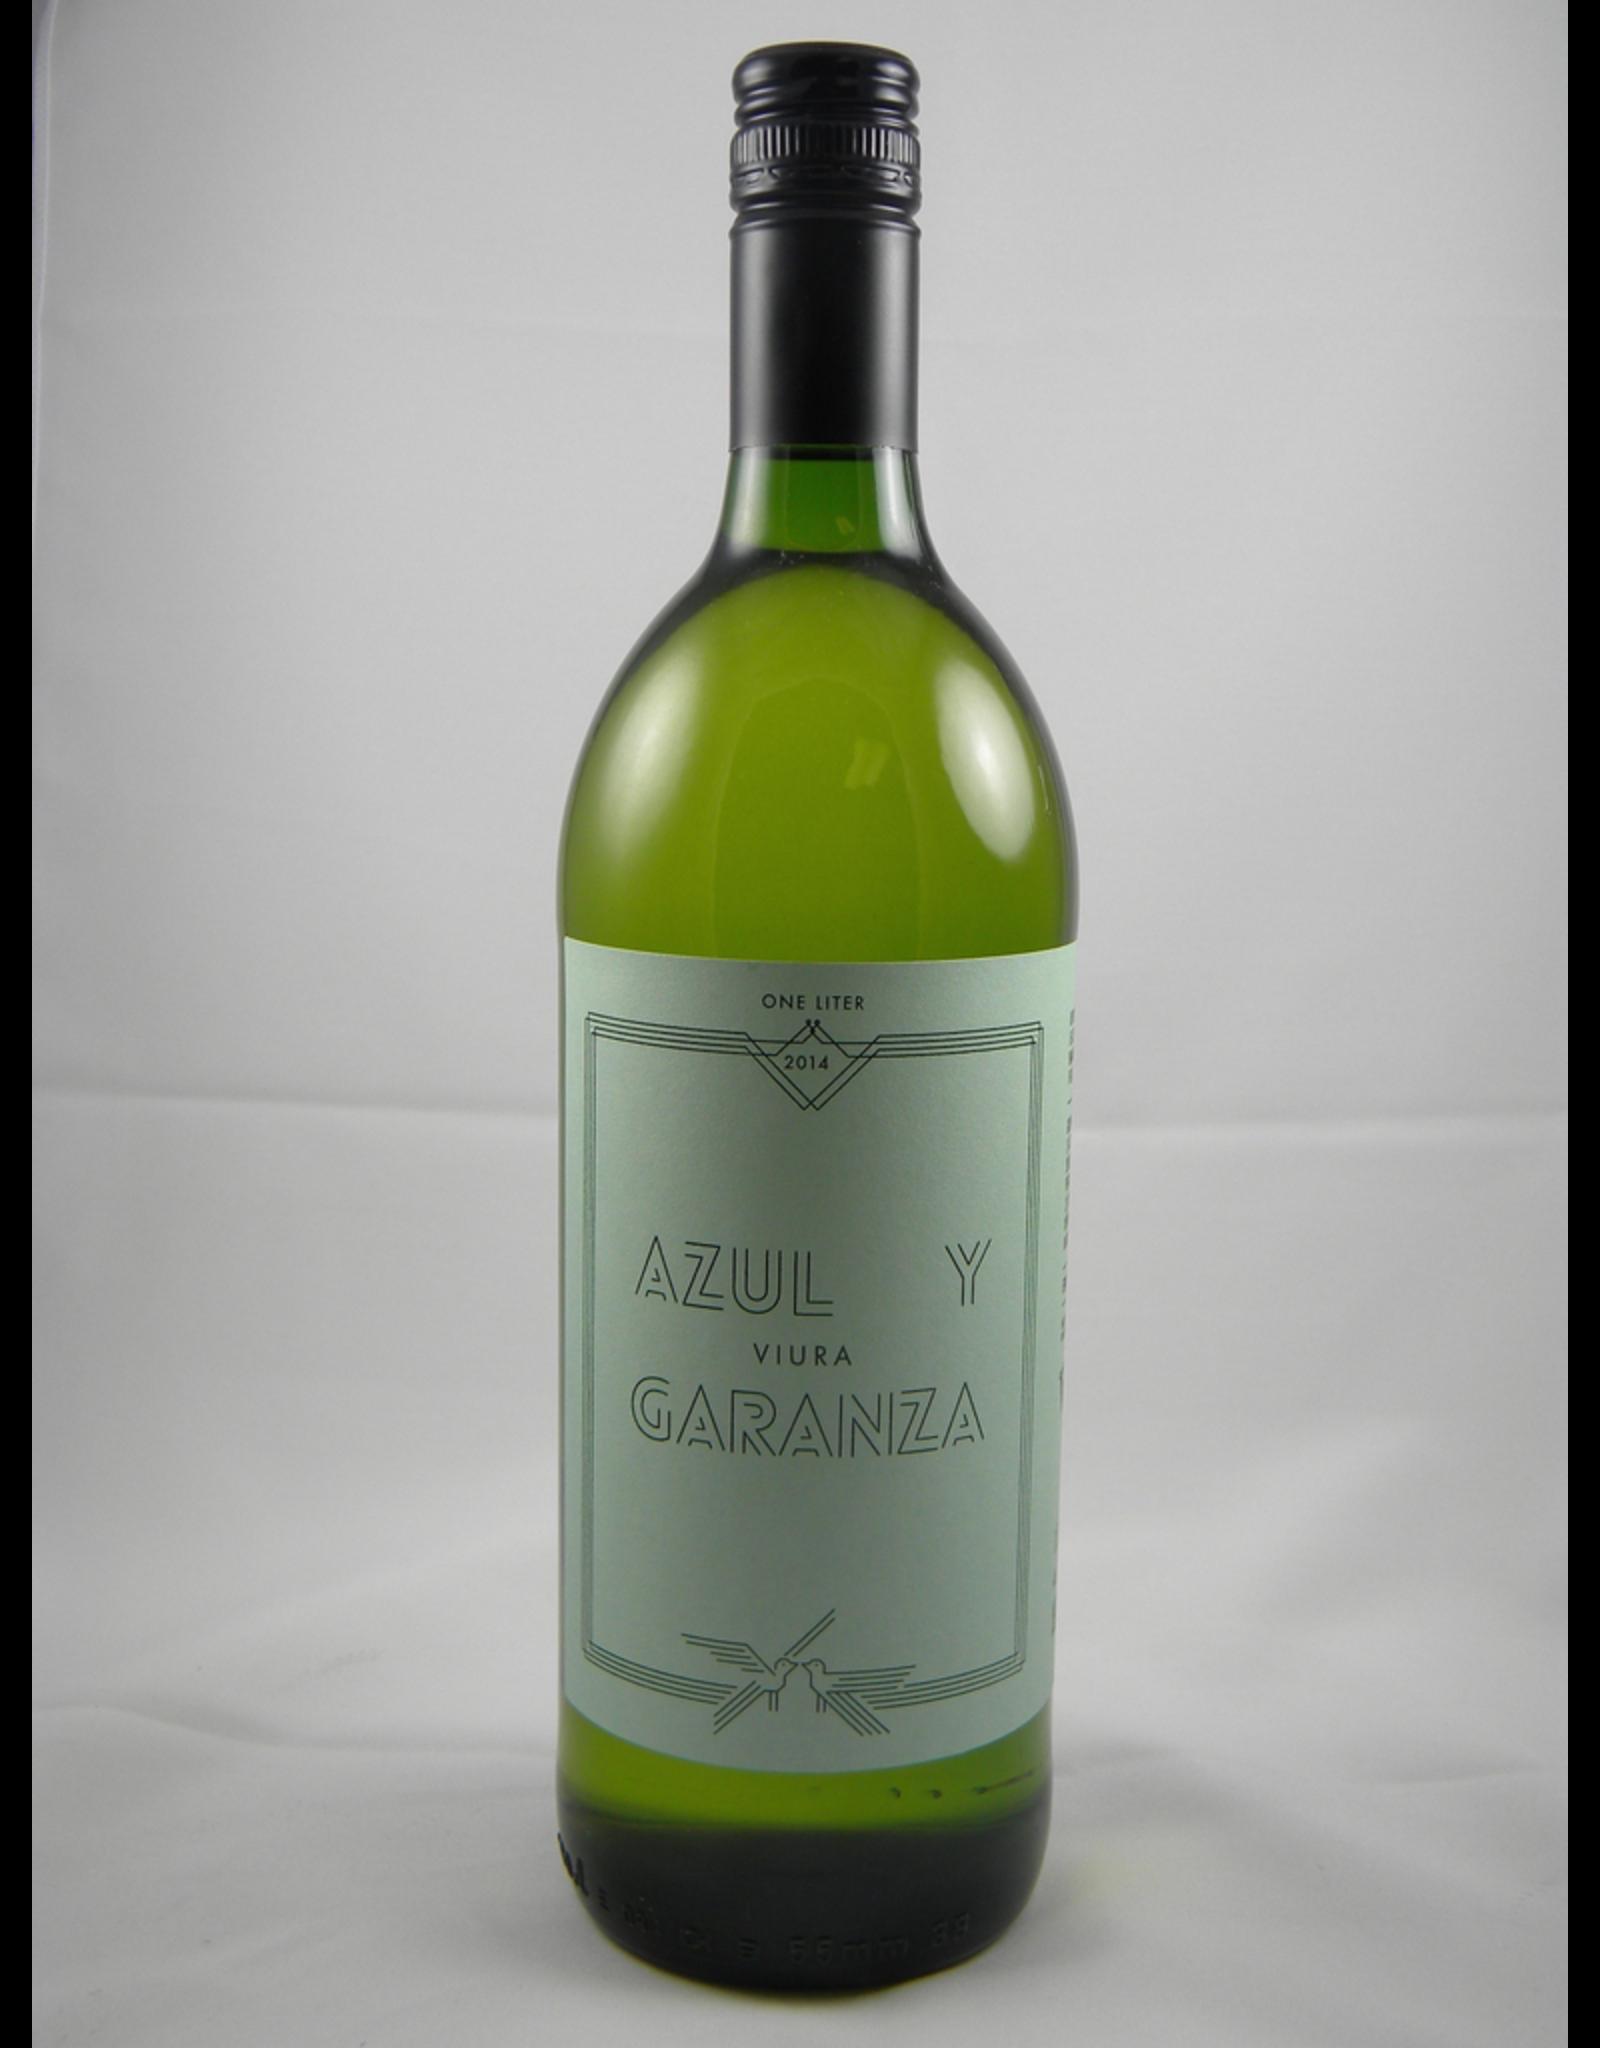 Azul Y Garanza Viura Navarra 2019